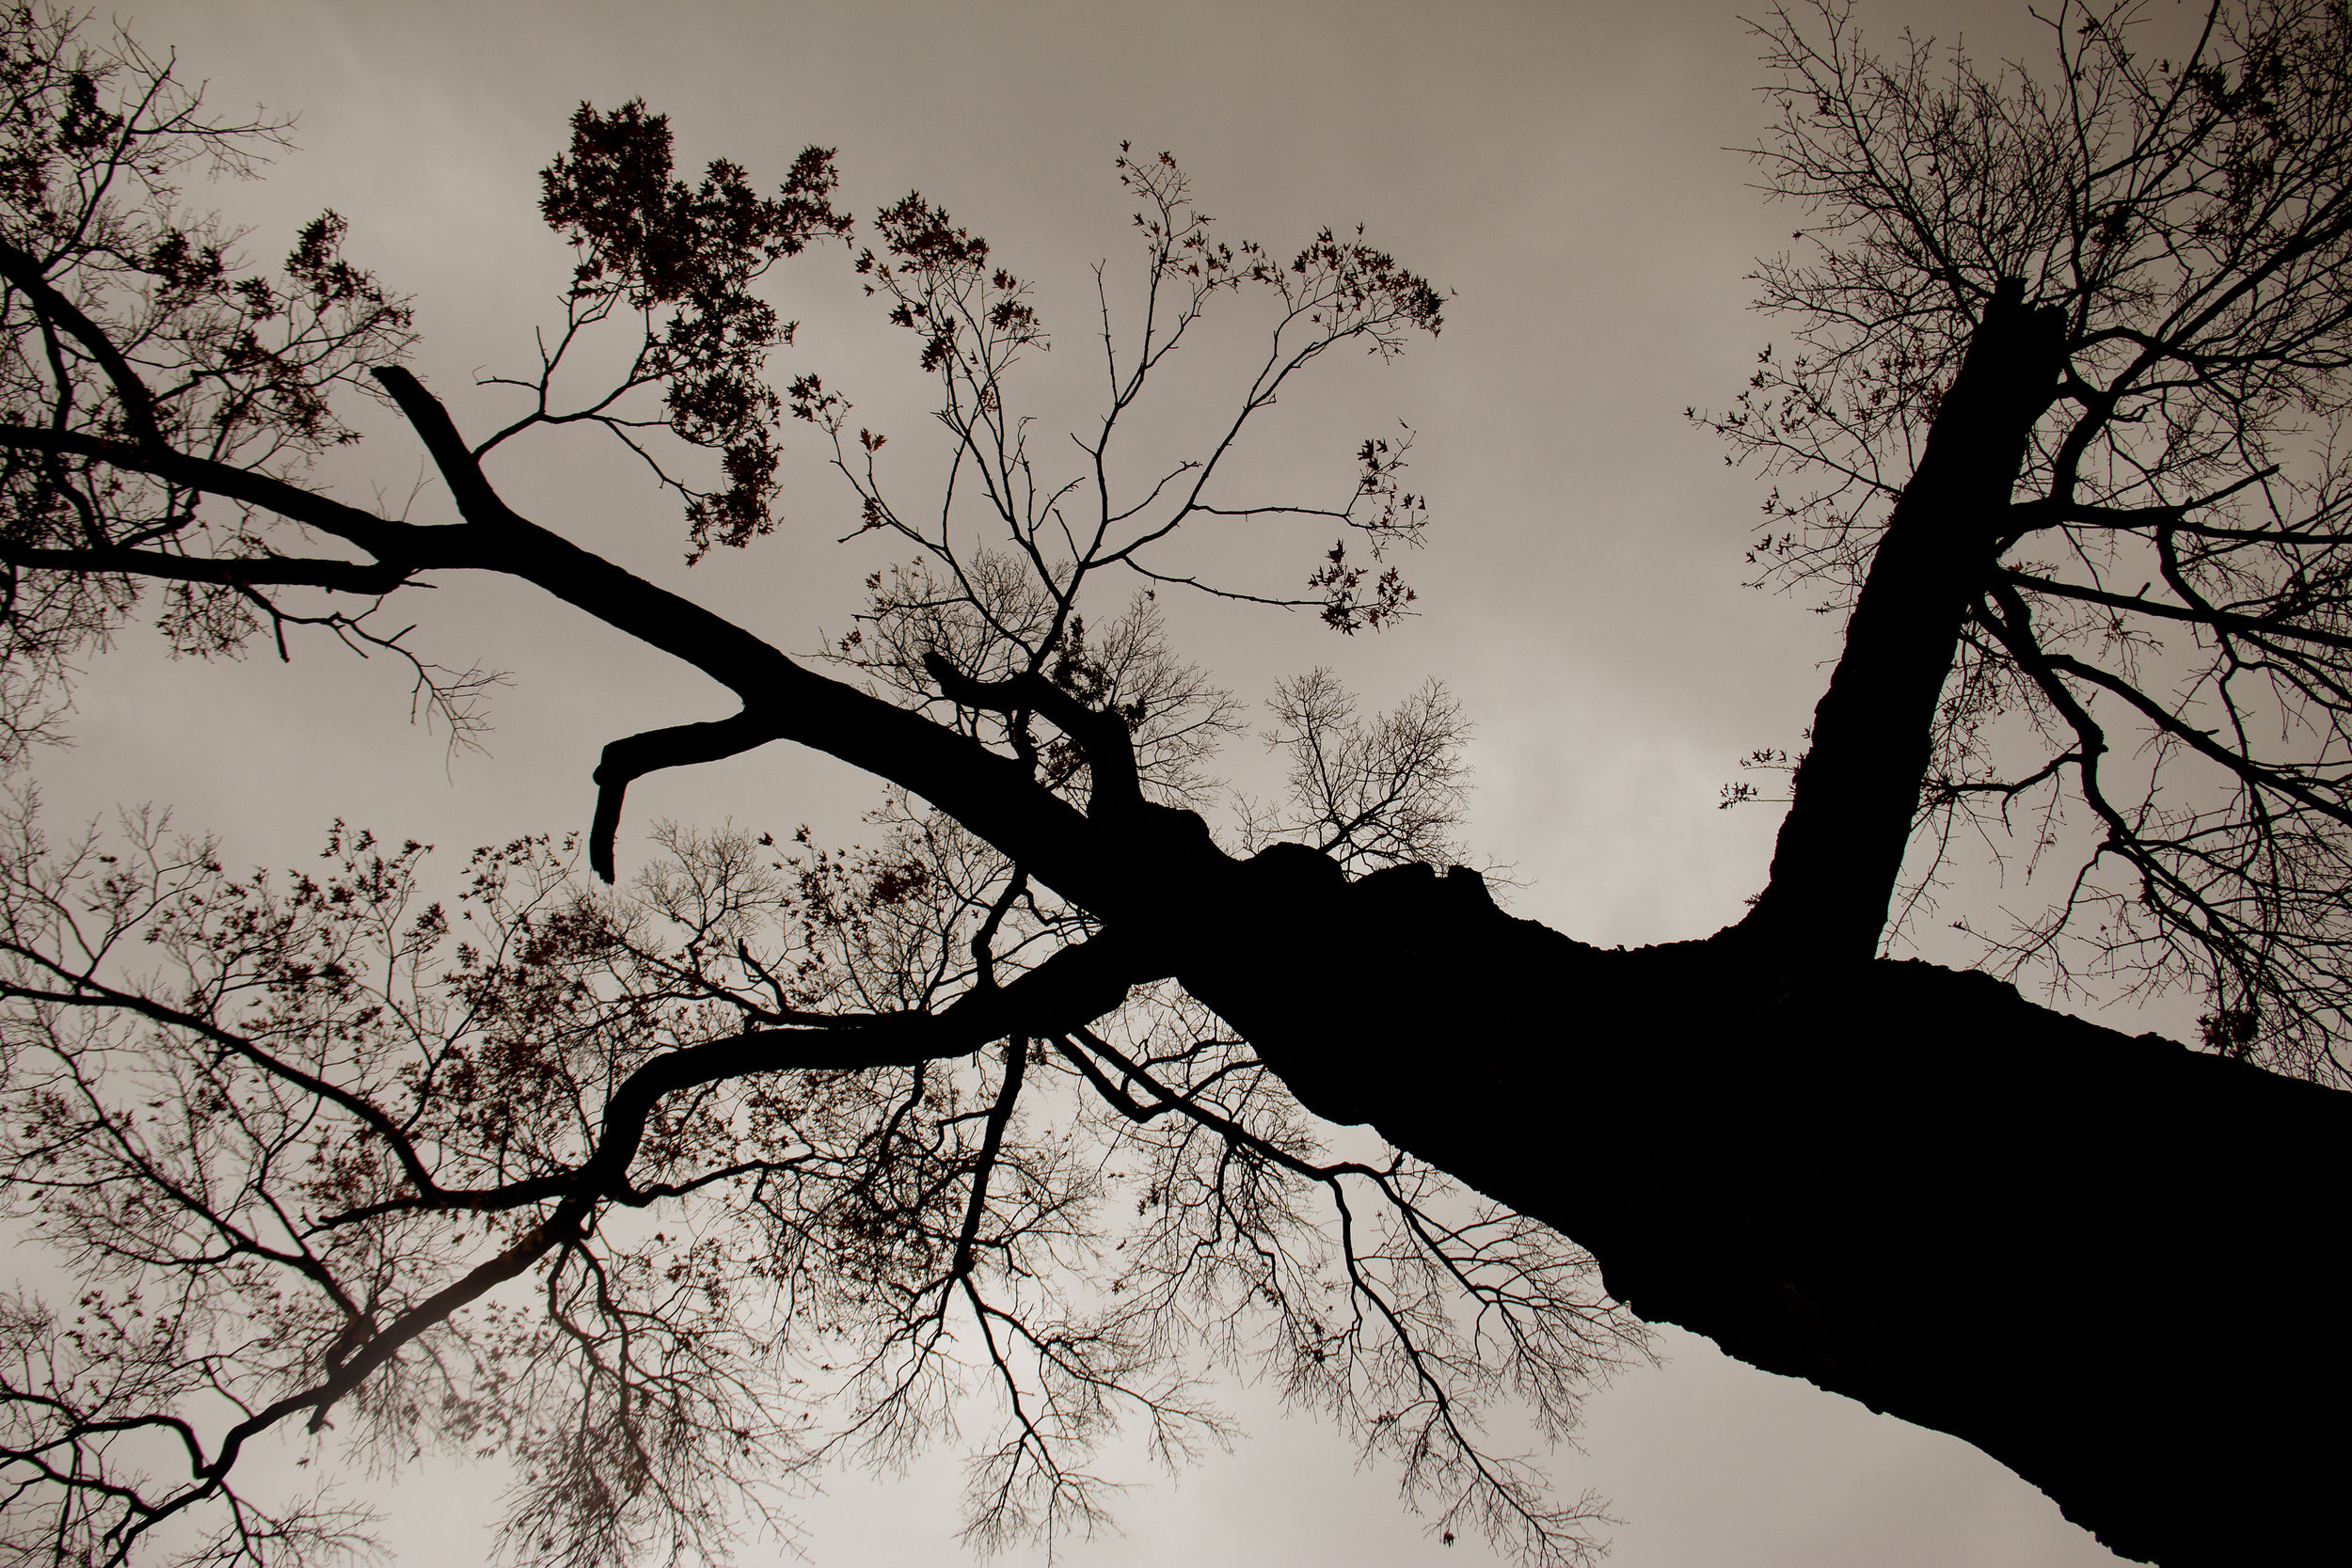 treesilhouette.jpg